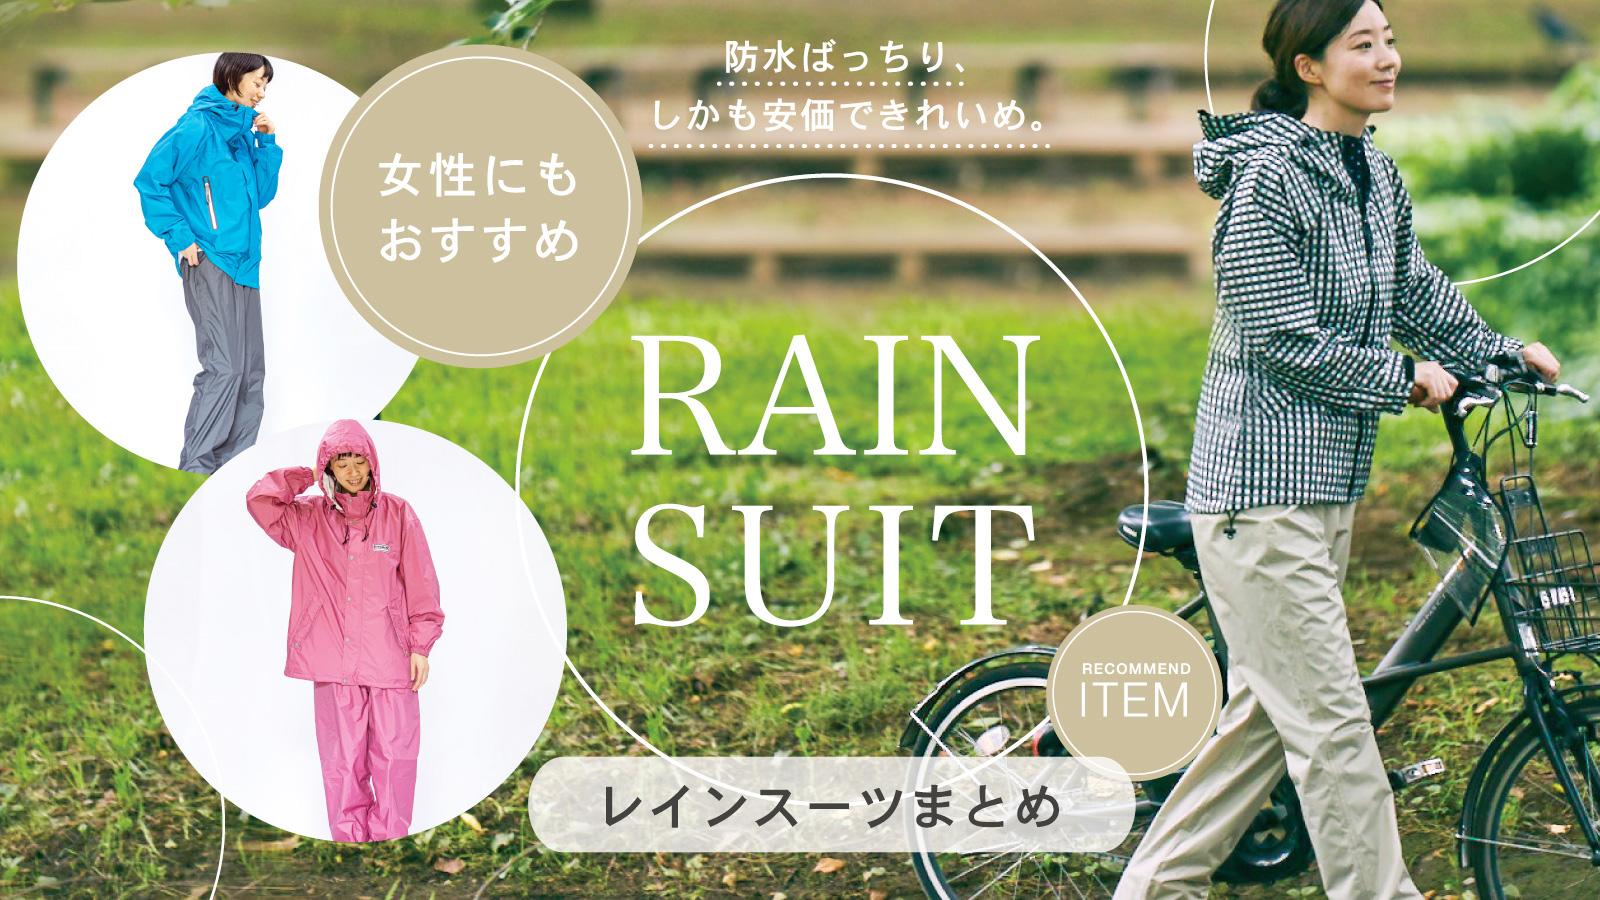 womens-rain-suit_1440_768.jpg